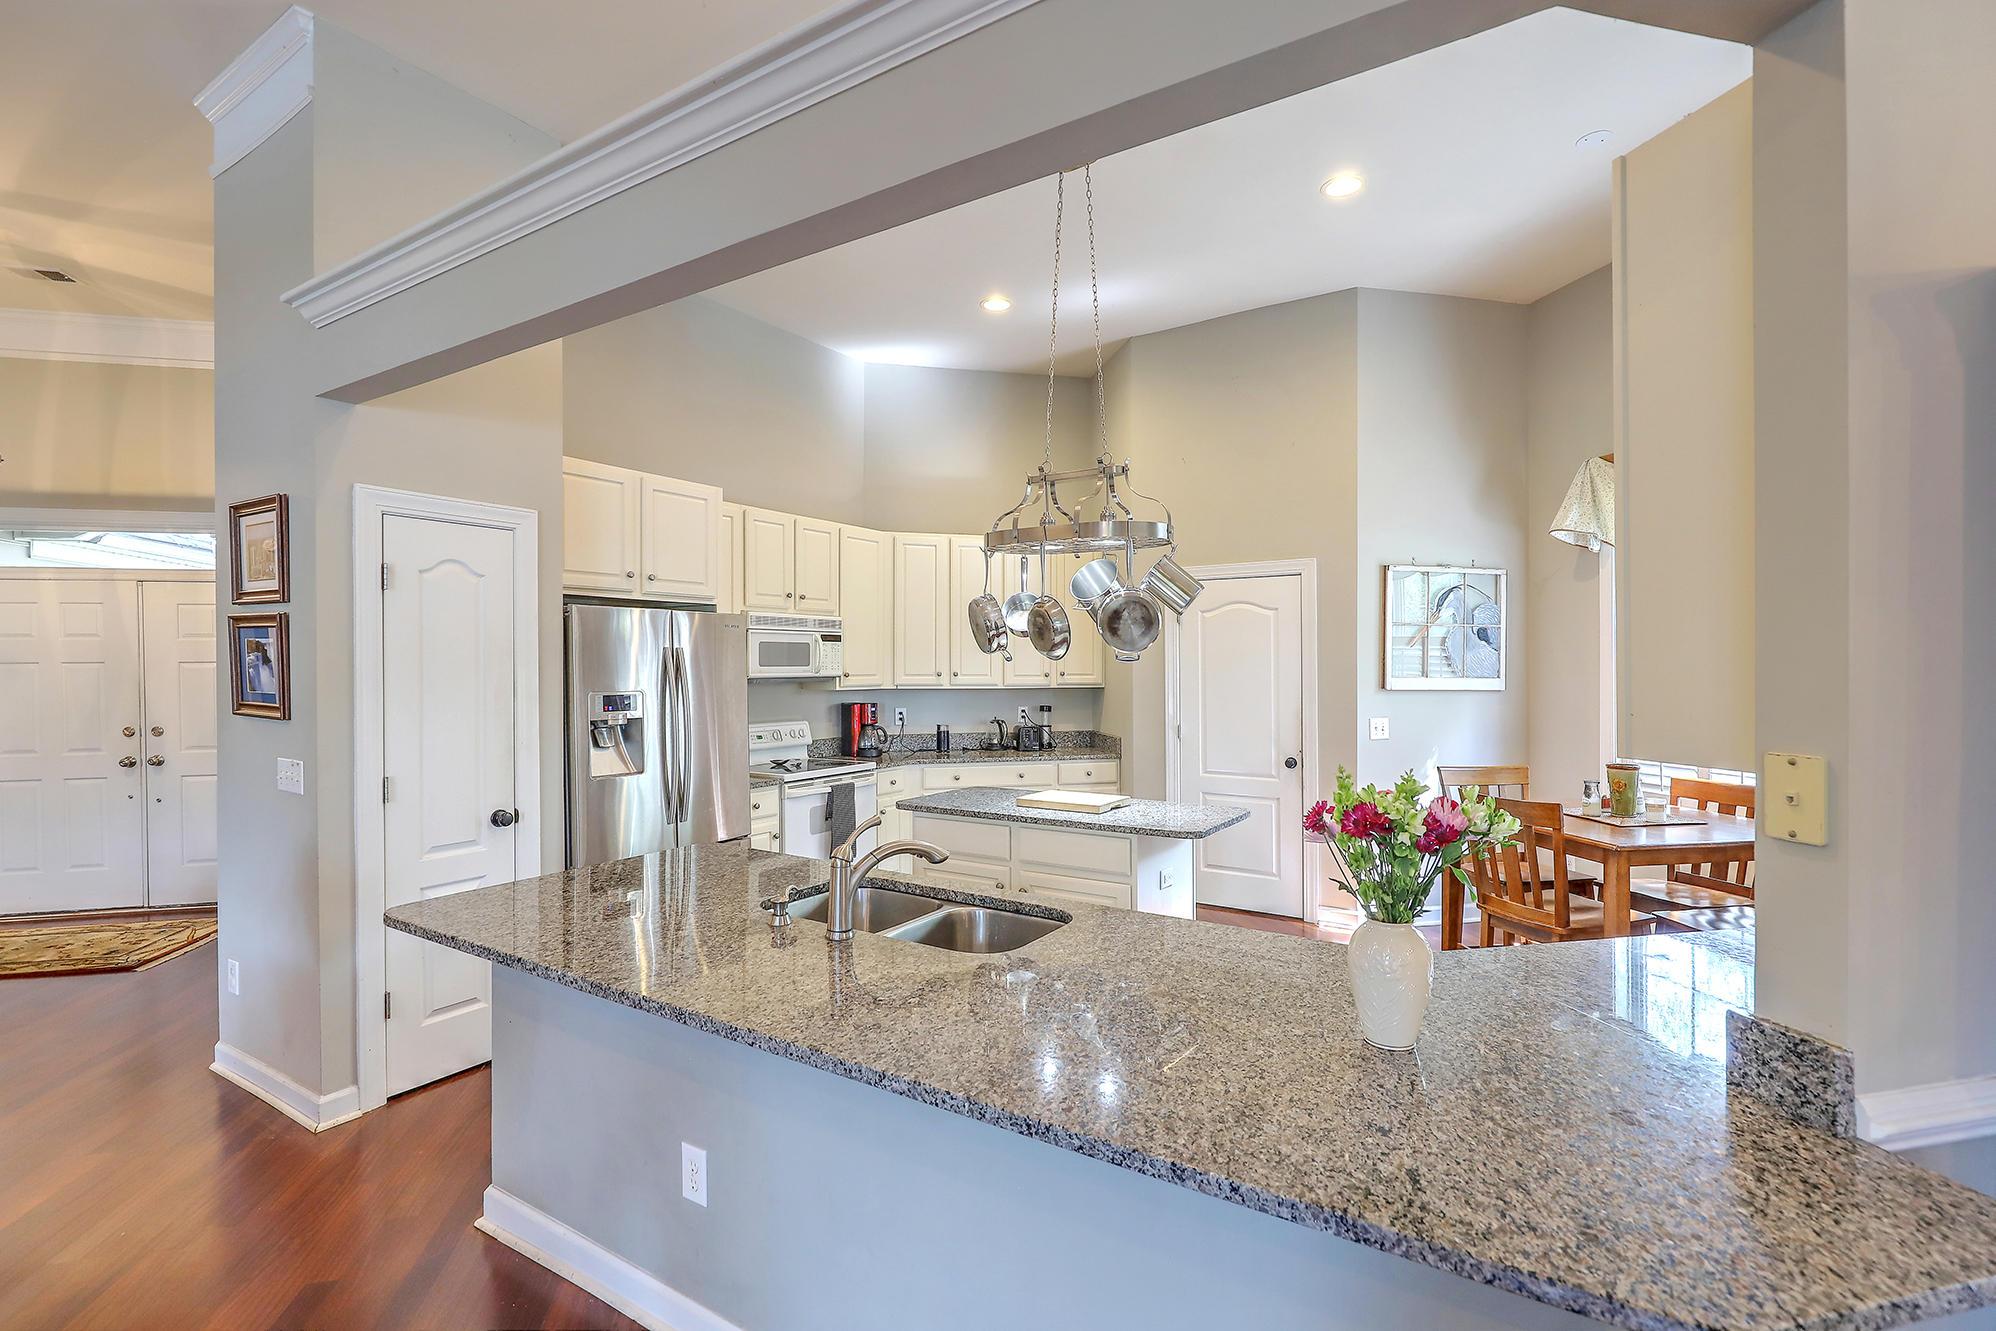 Seaside Farms Homes For Sale - 1244 Palmetto Peninsula, Mount Pleasant, SC - 8